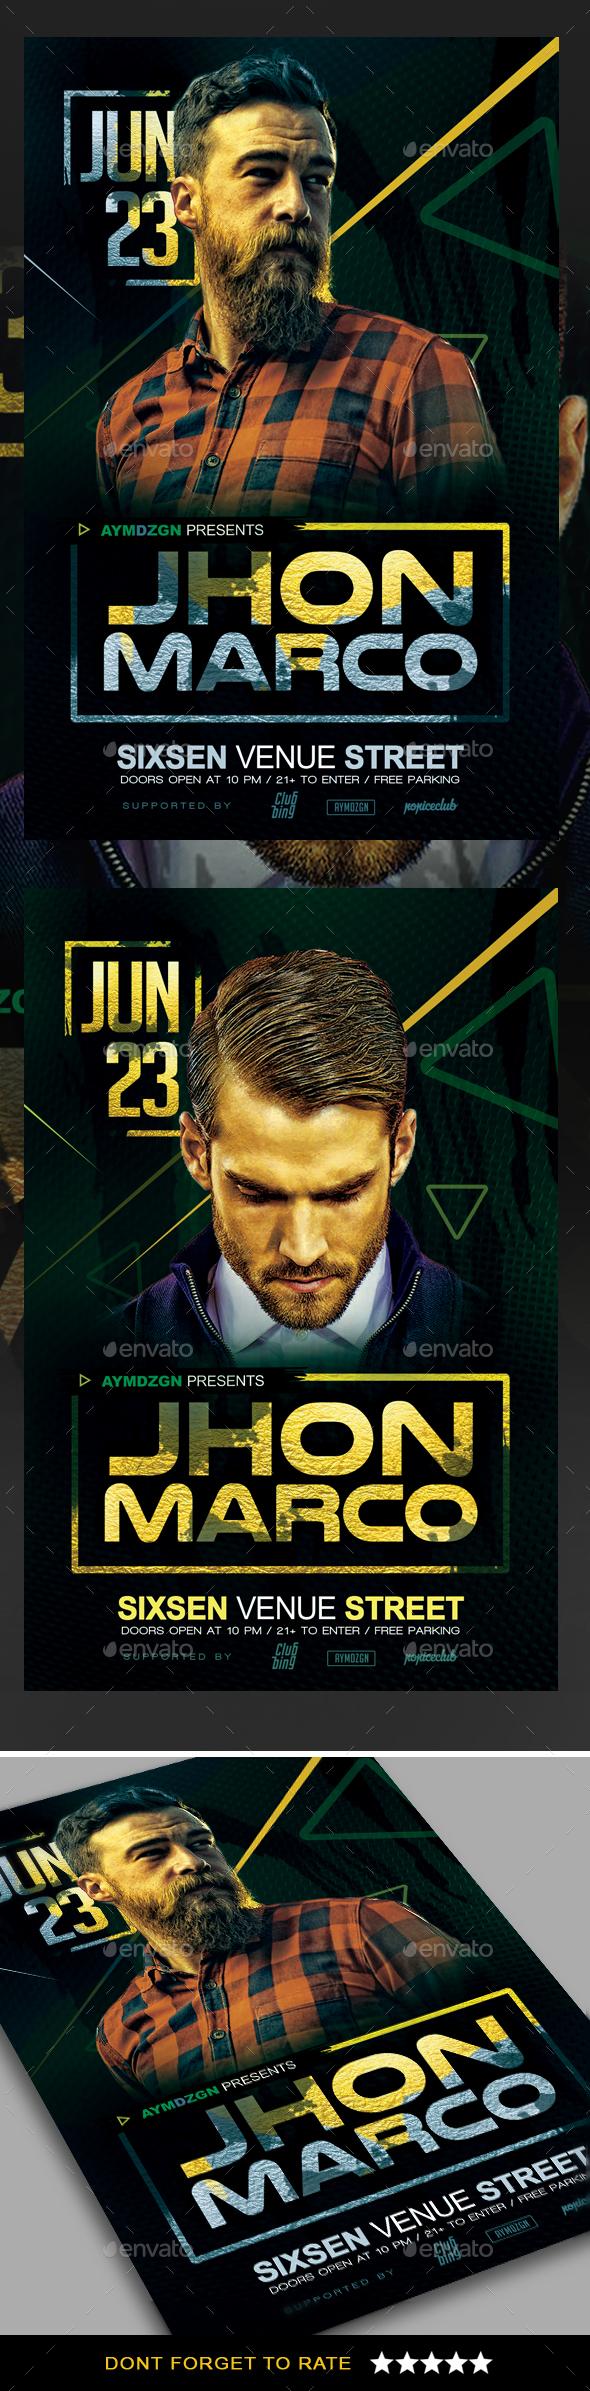 DJ Concert Flyer - Clubs & Parties Events